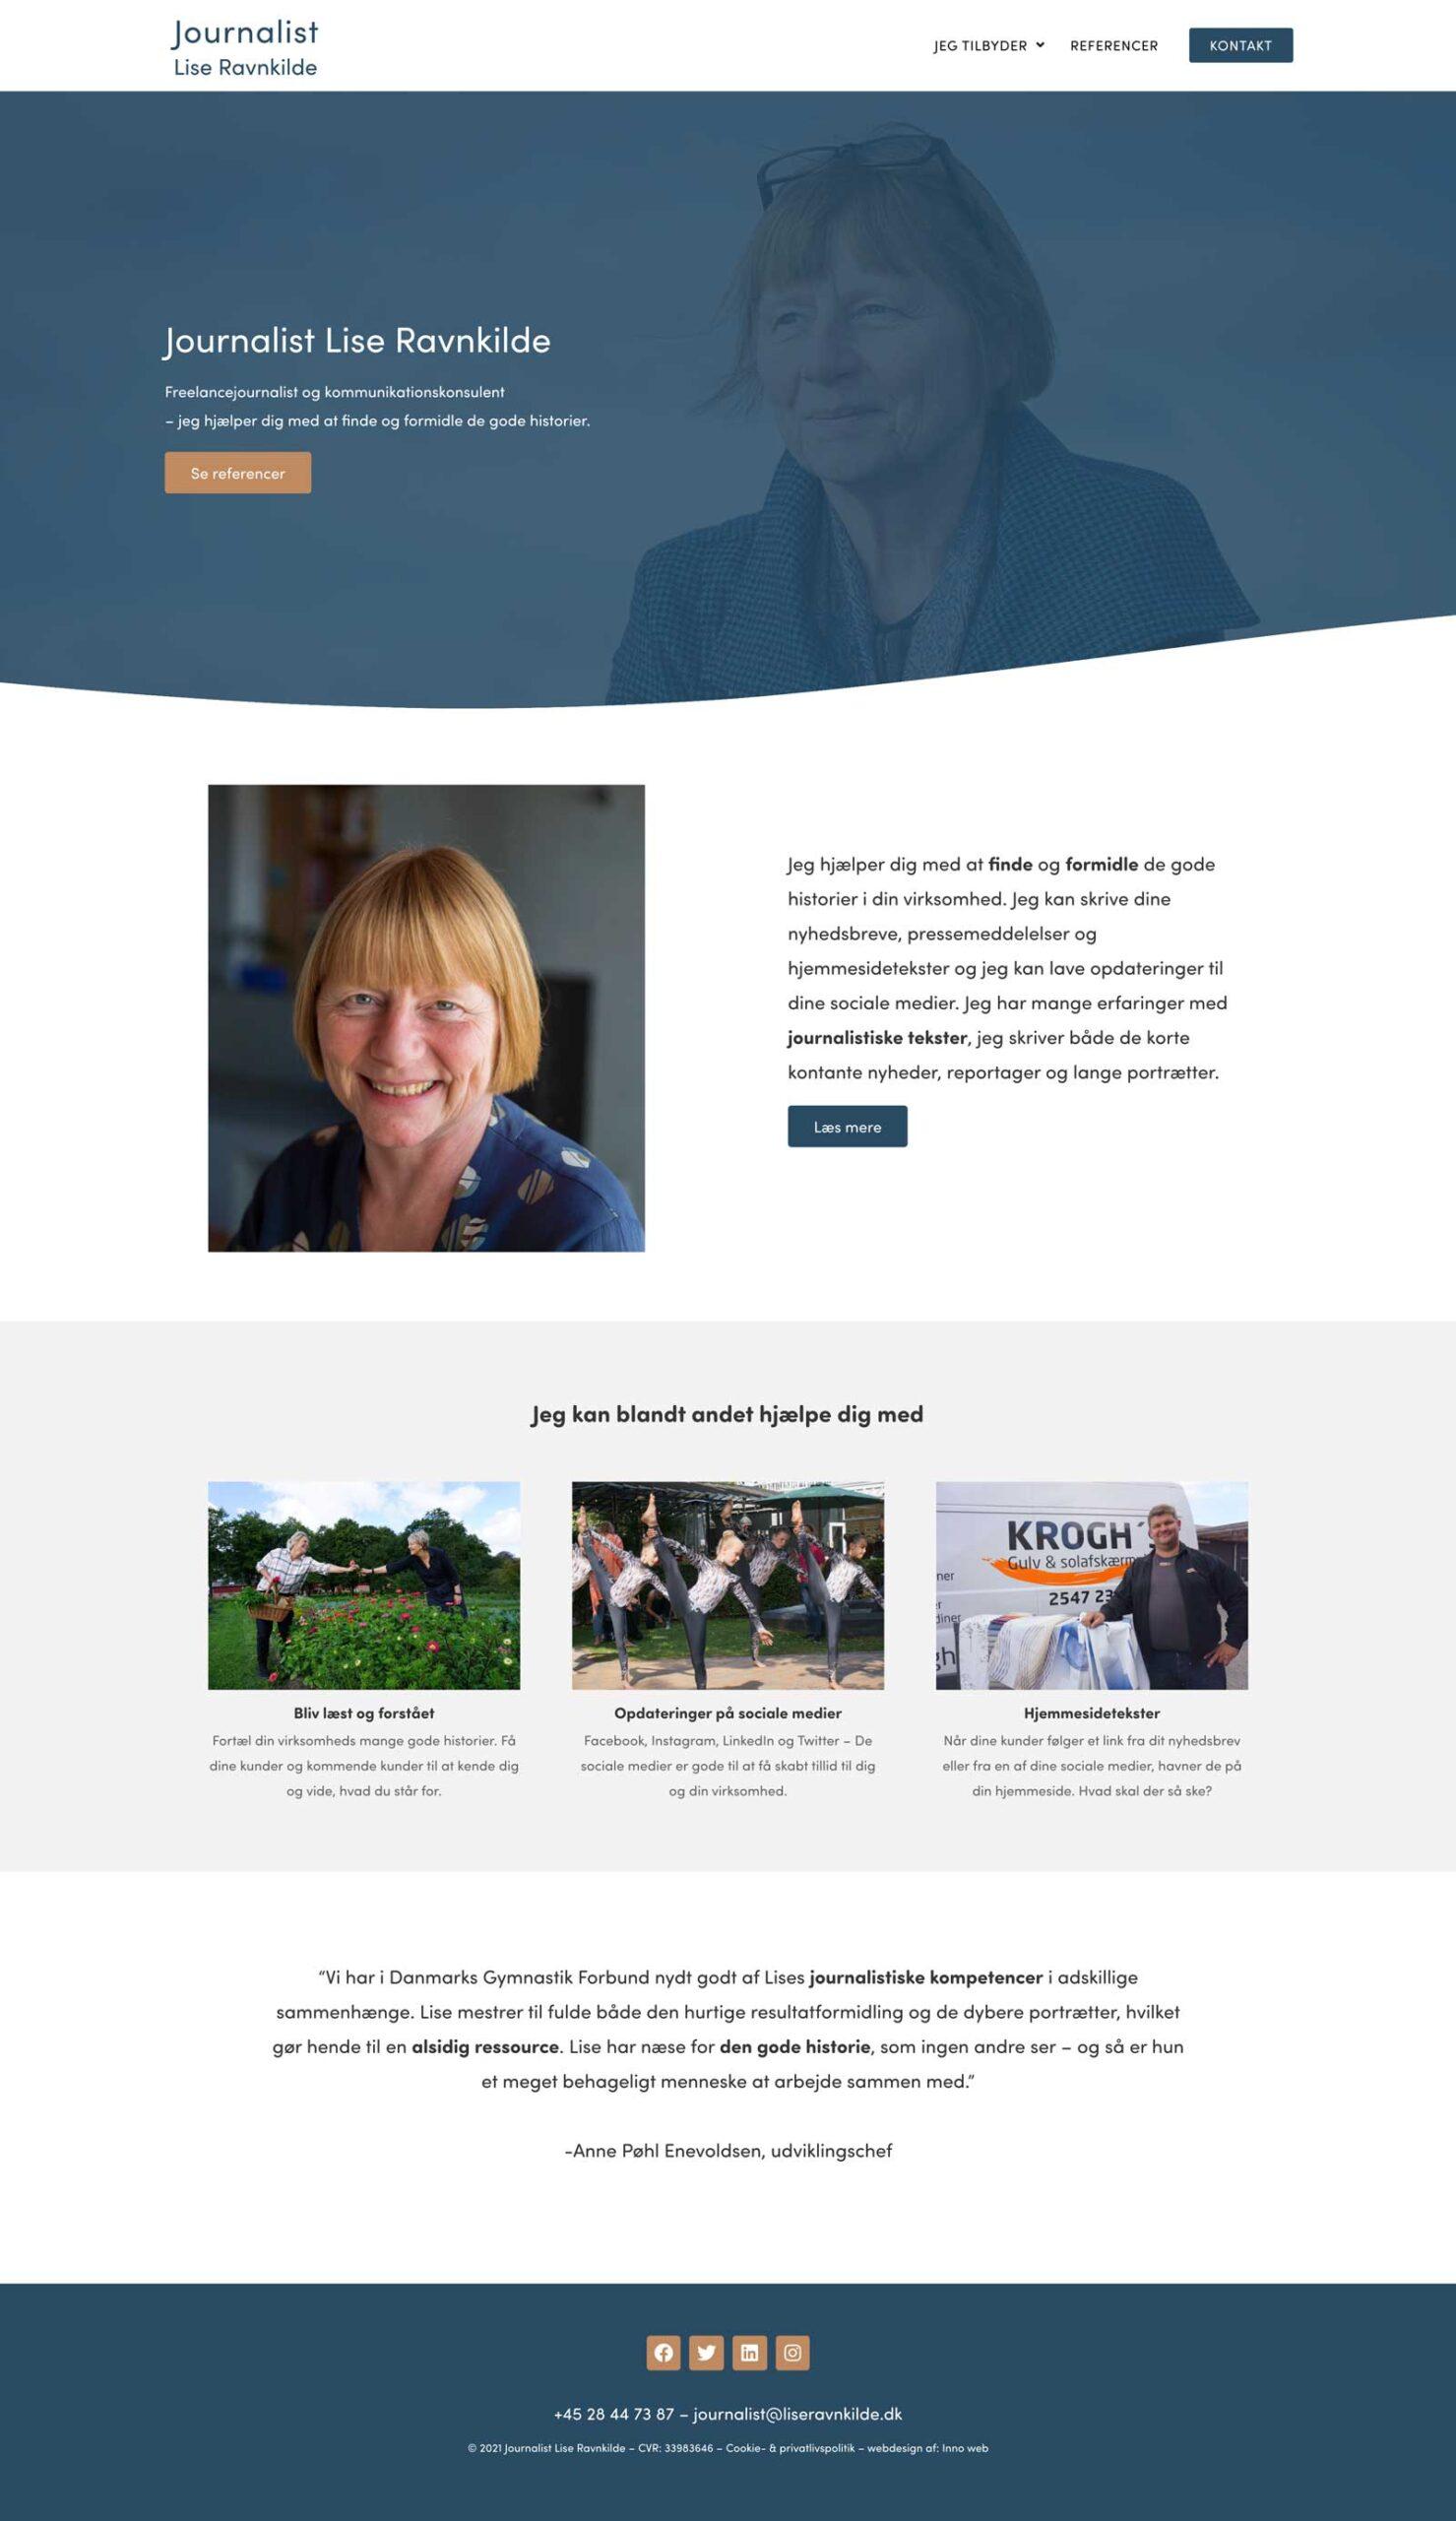 hjemmeside designer